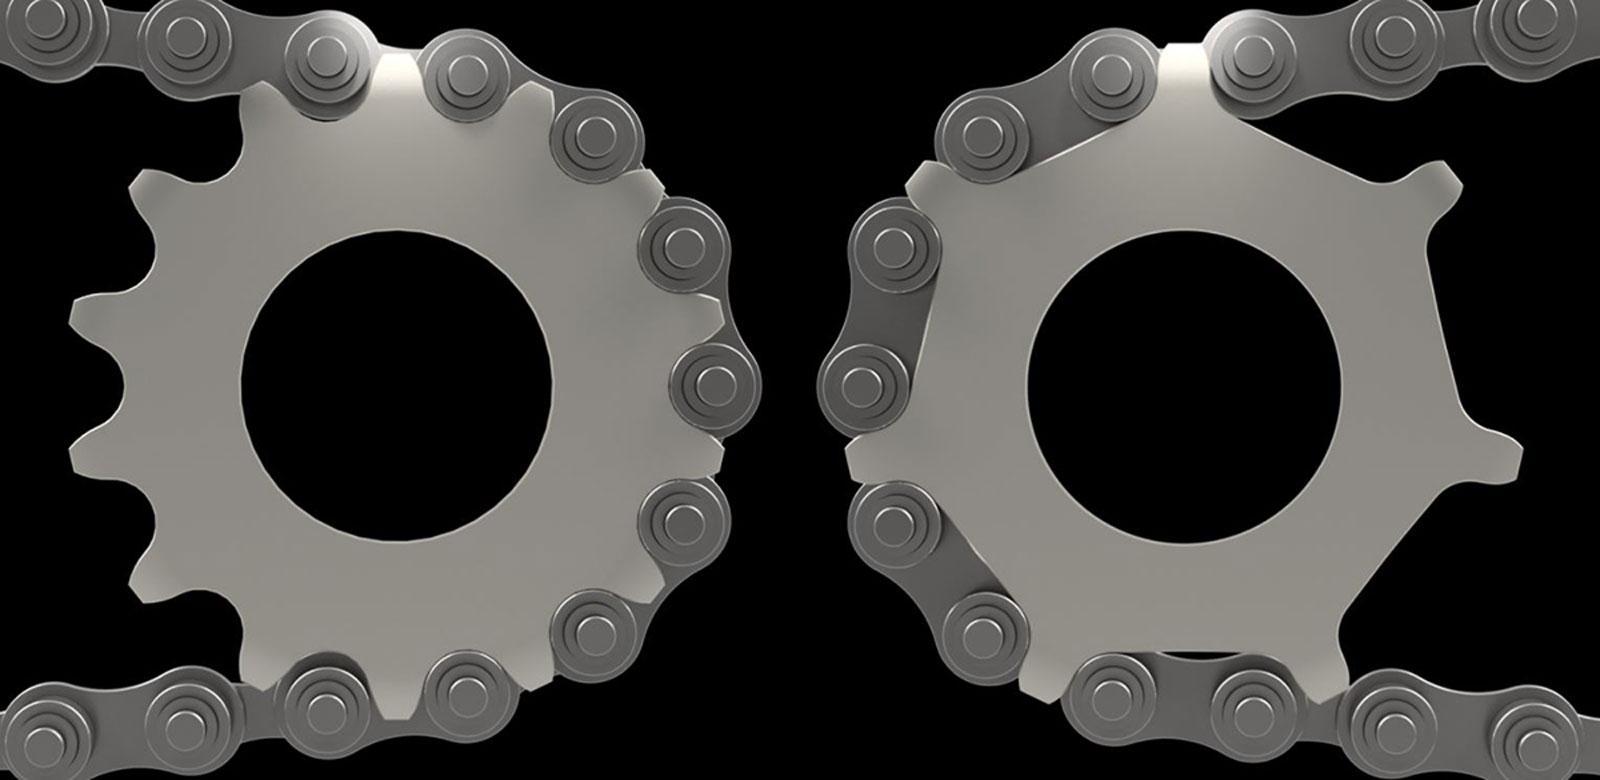 traditional sprocket versus new motion labs enduo evolve sprocket half chain concept